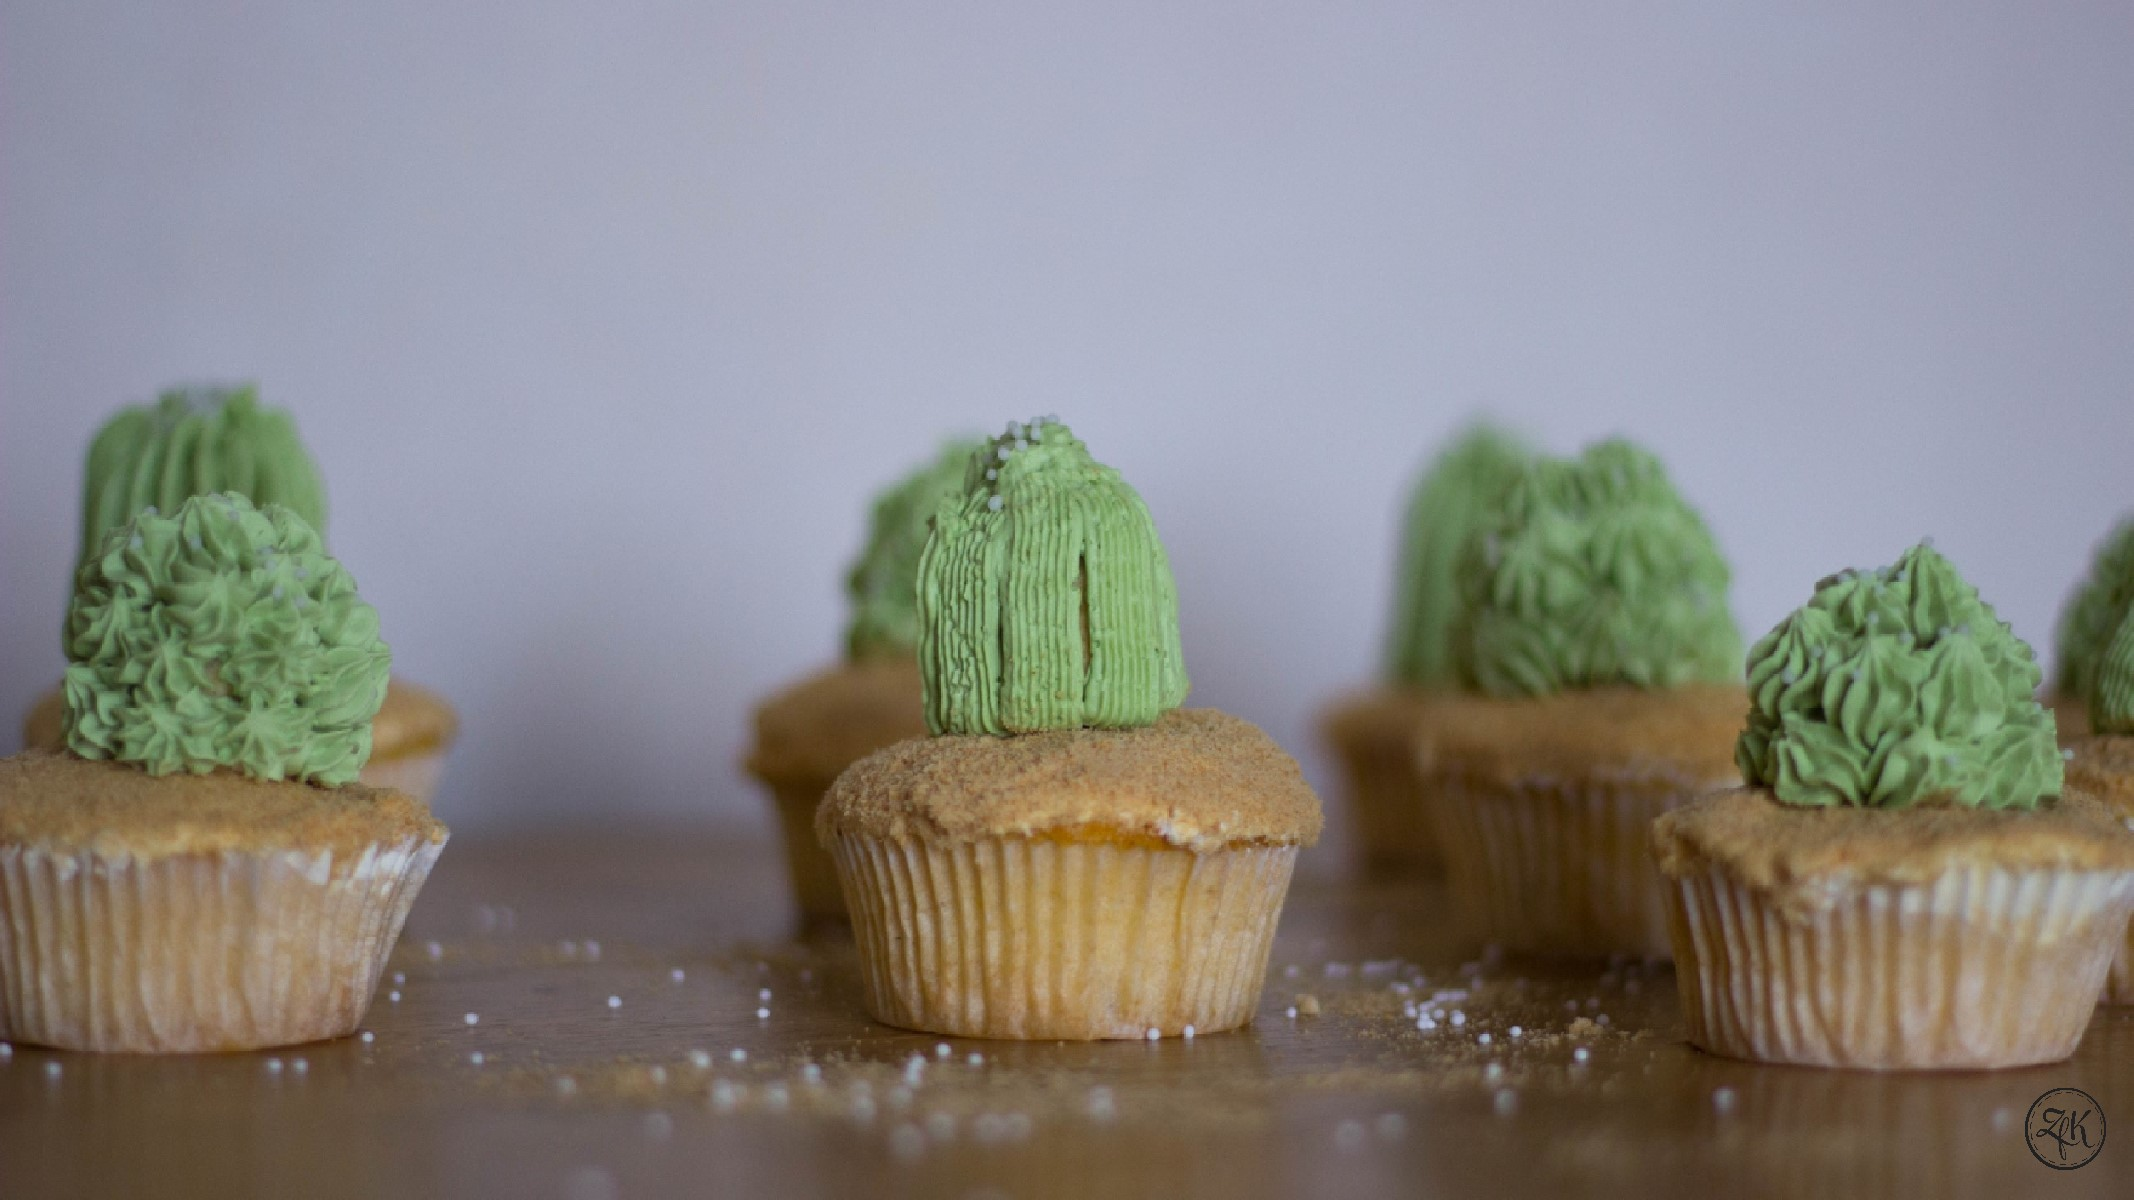 ZfK_Kaktus_Muffins_01